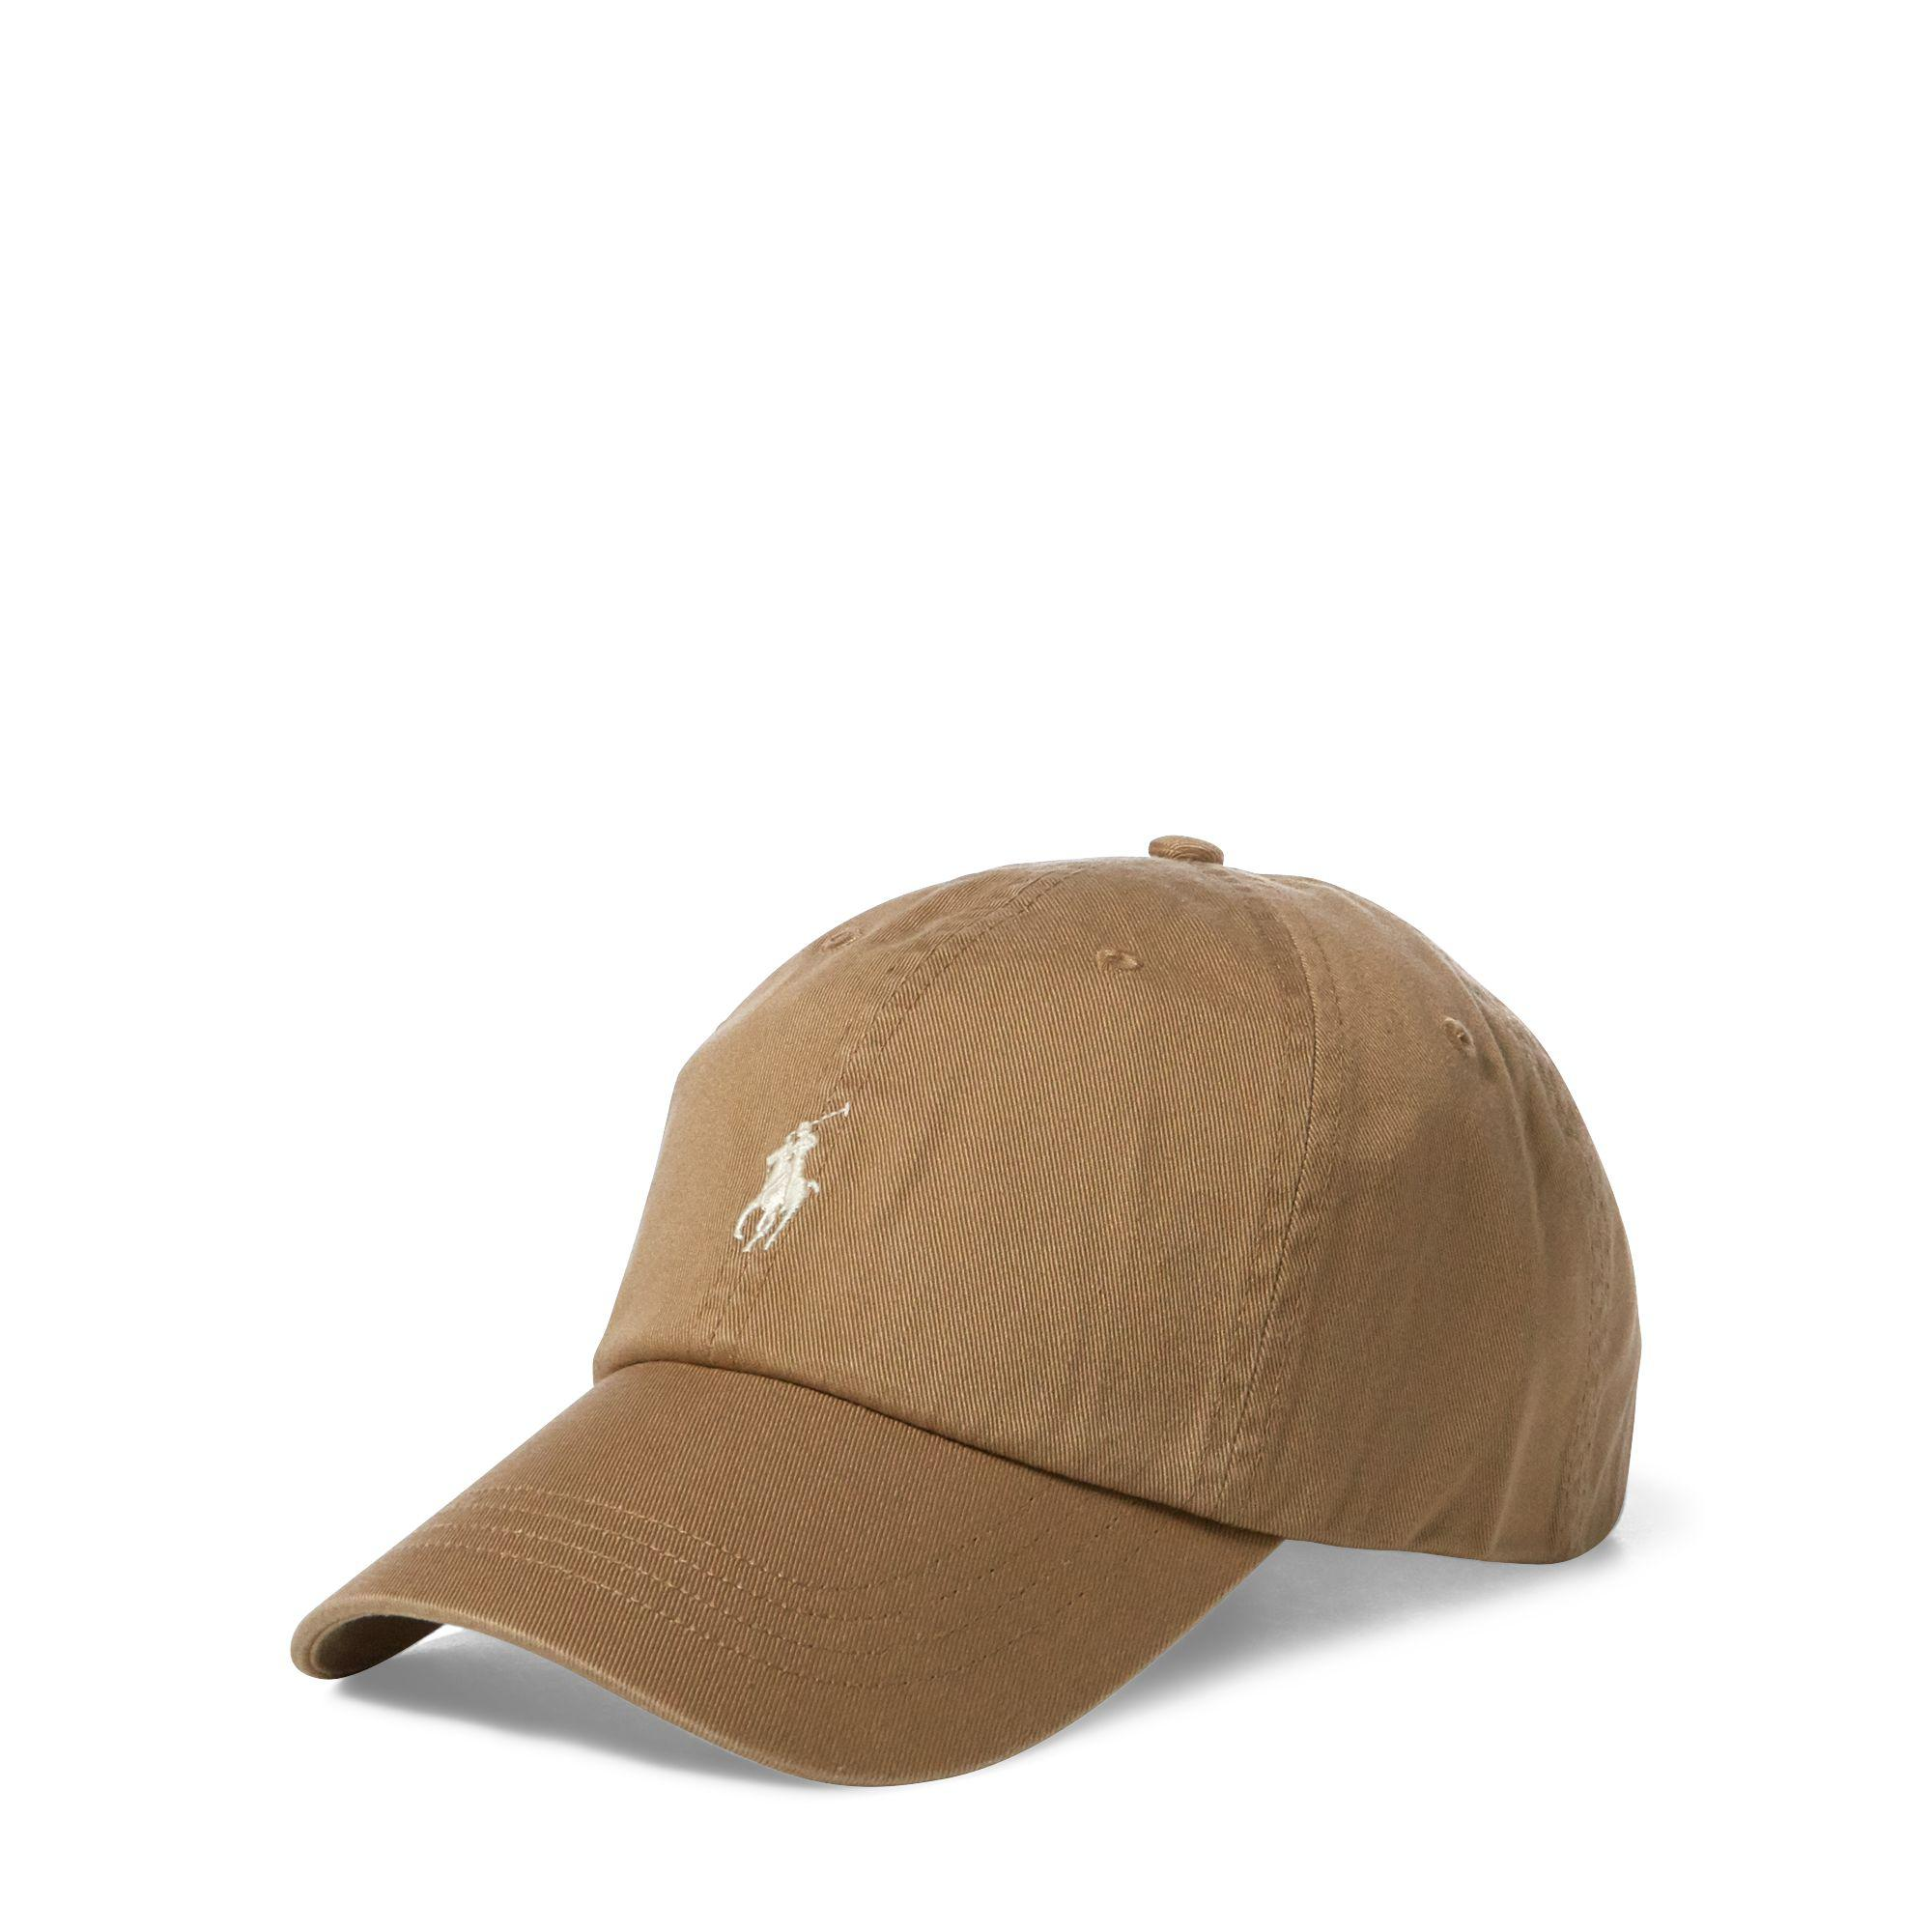 a24f43de ... canada lyst polo ralph lauren cotton chino baseball cap in brown for men  e6d2b 6e4fb